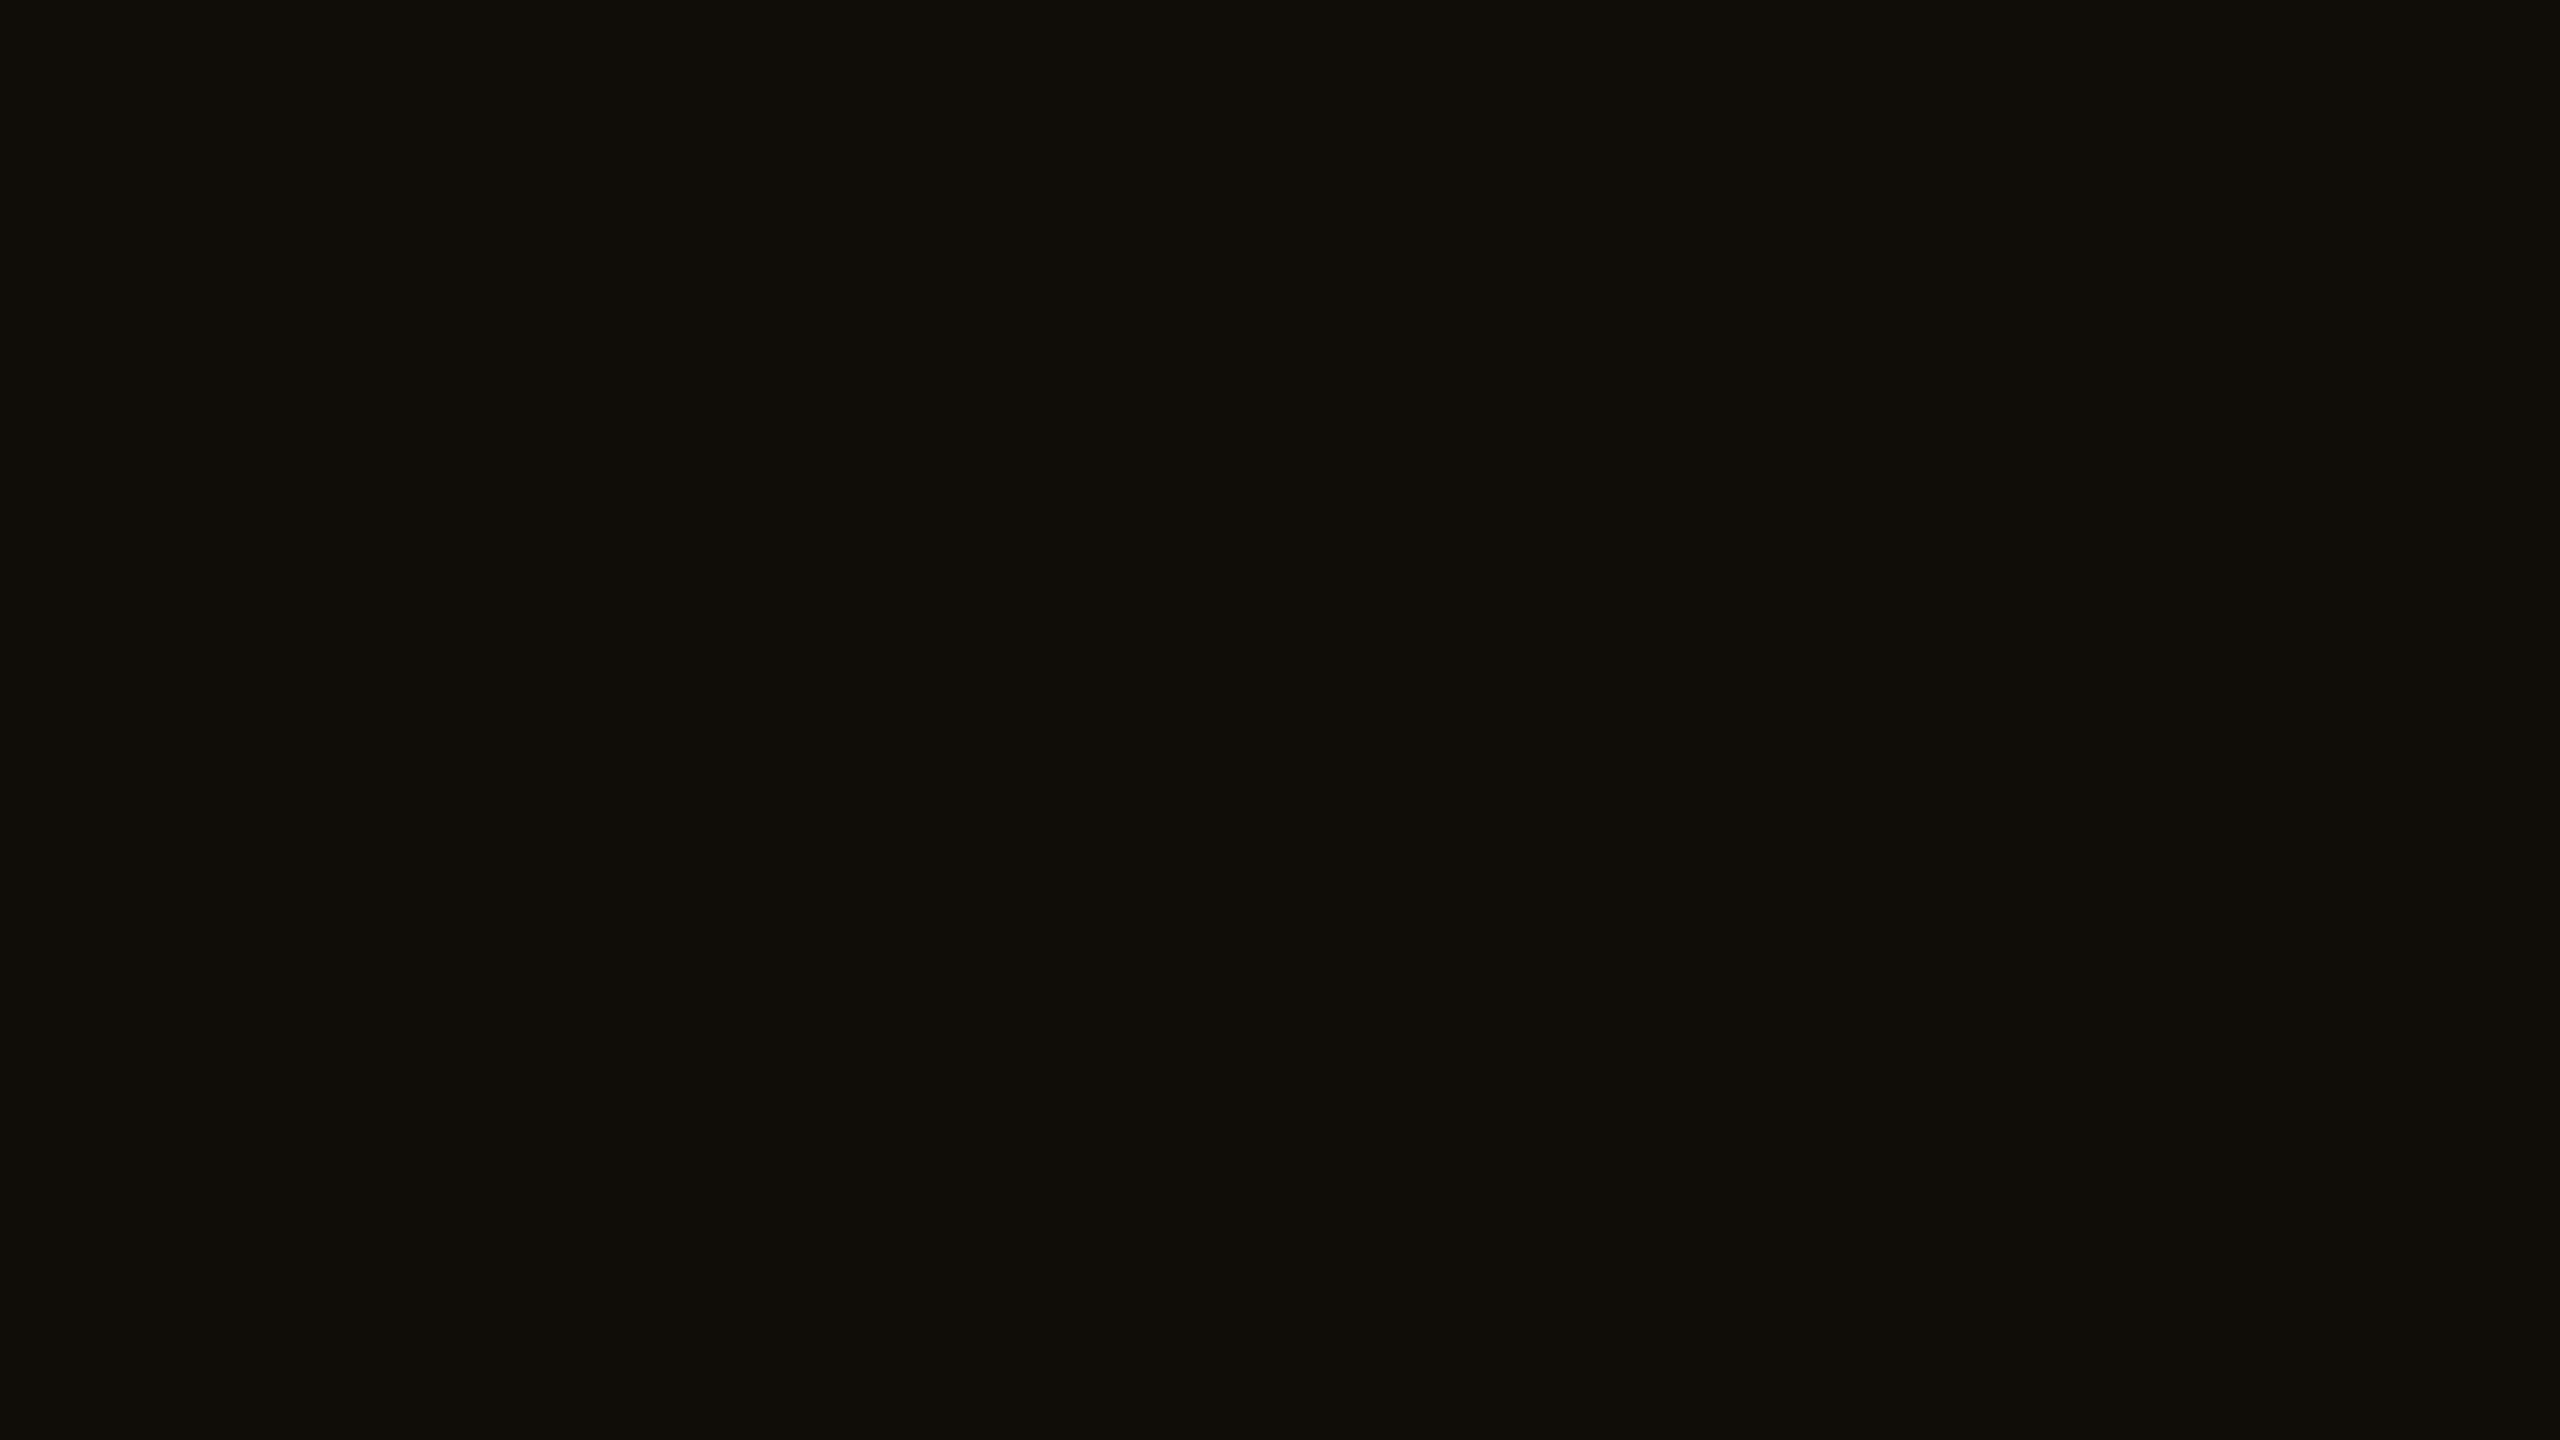 Res: 2560x1440, Black Wallpaper in 2K Resolution